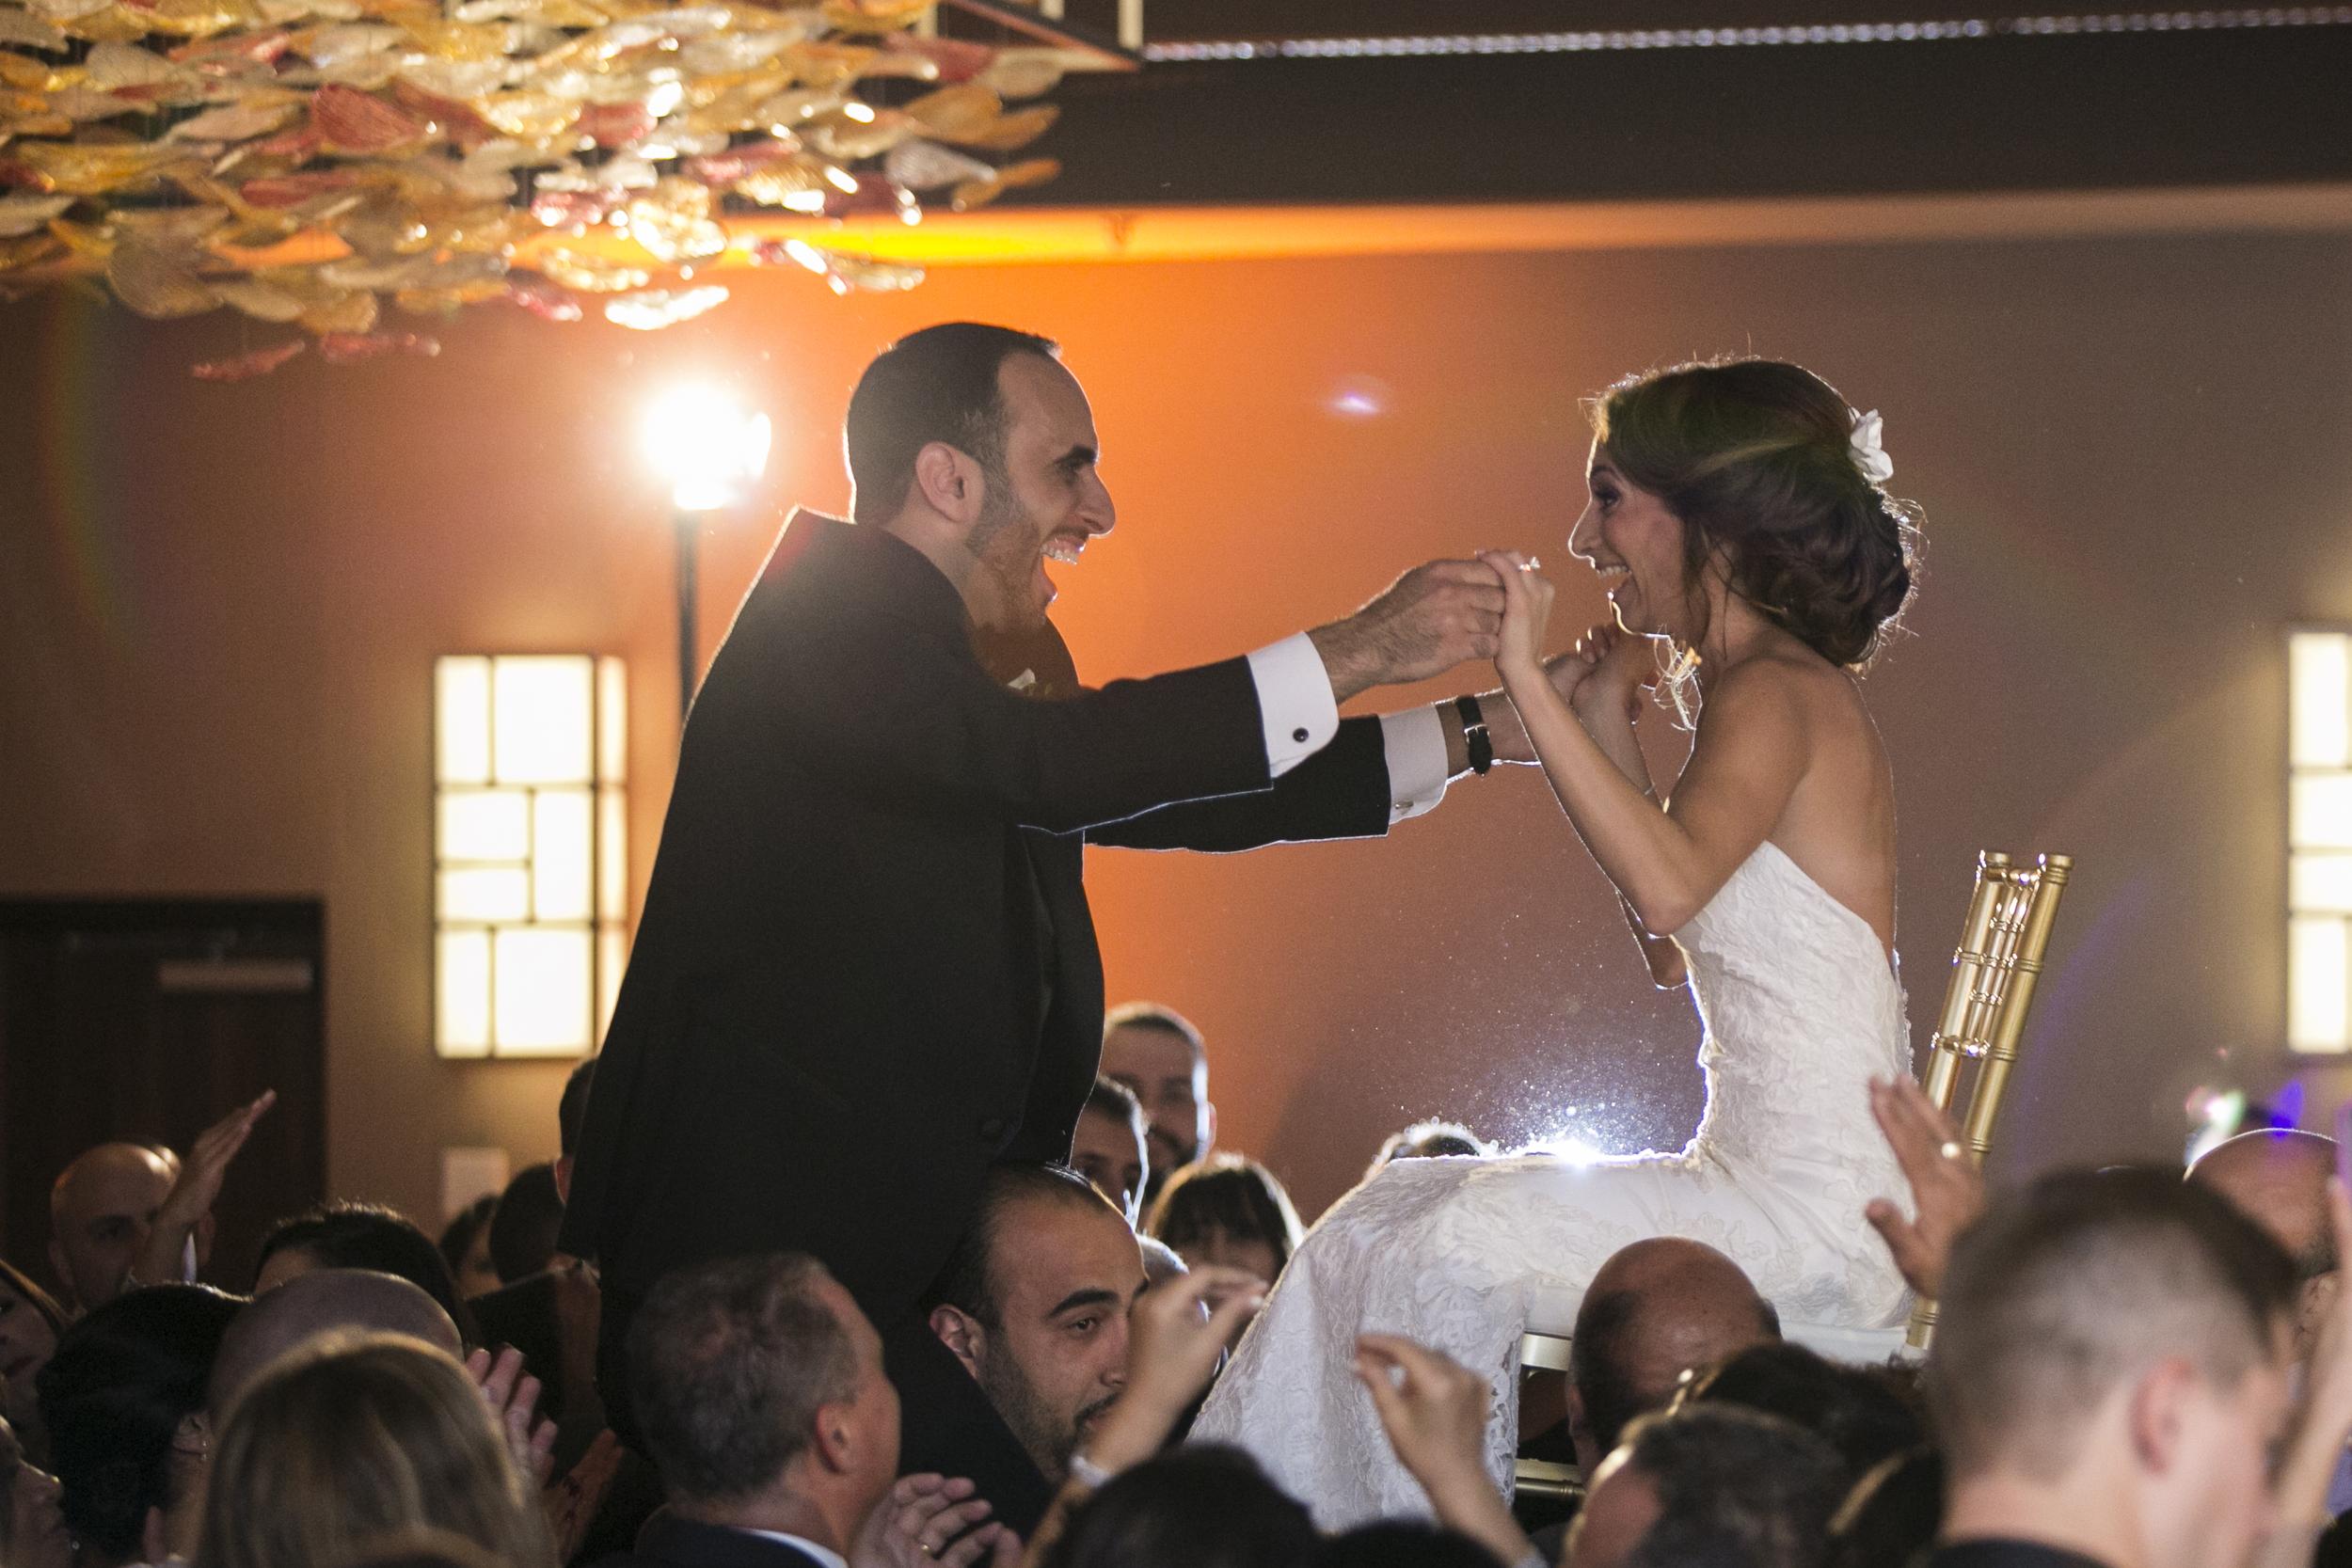 Persian Wedding-South San Francisco-Meo Baaklini29.jpg